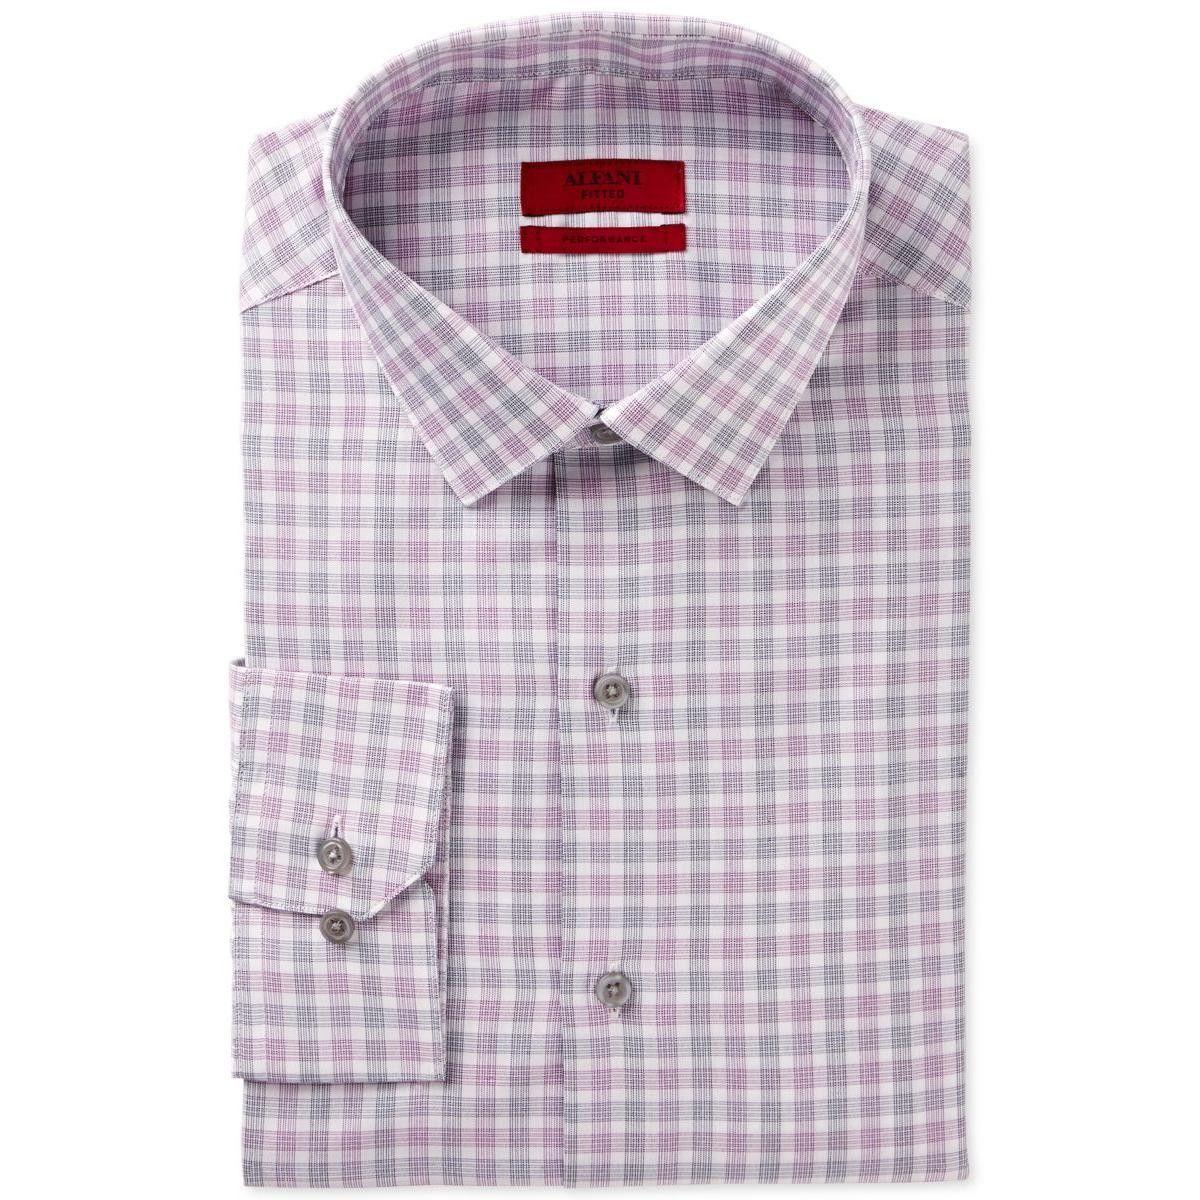 Alfani Mens Performance Checkered Dress Shirt